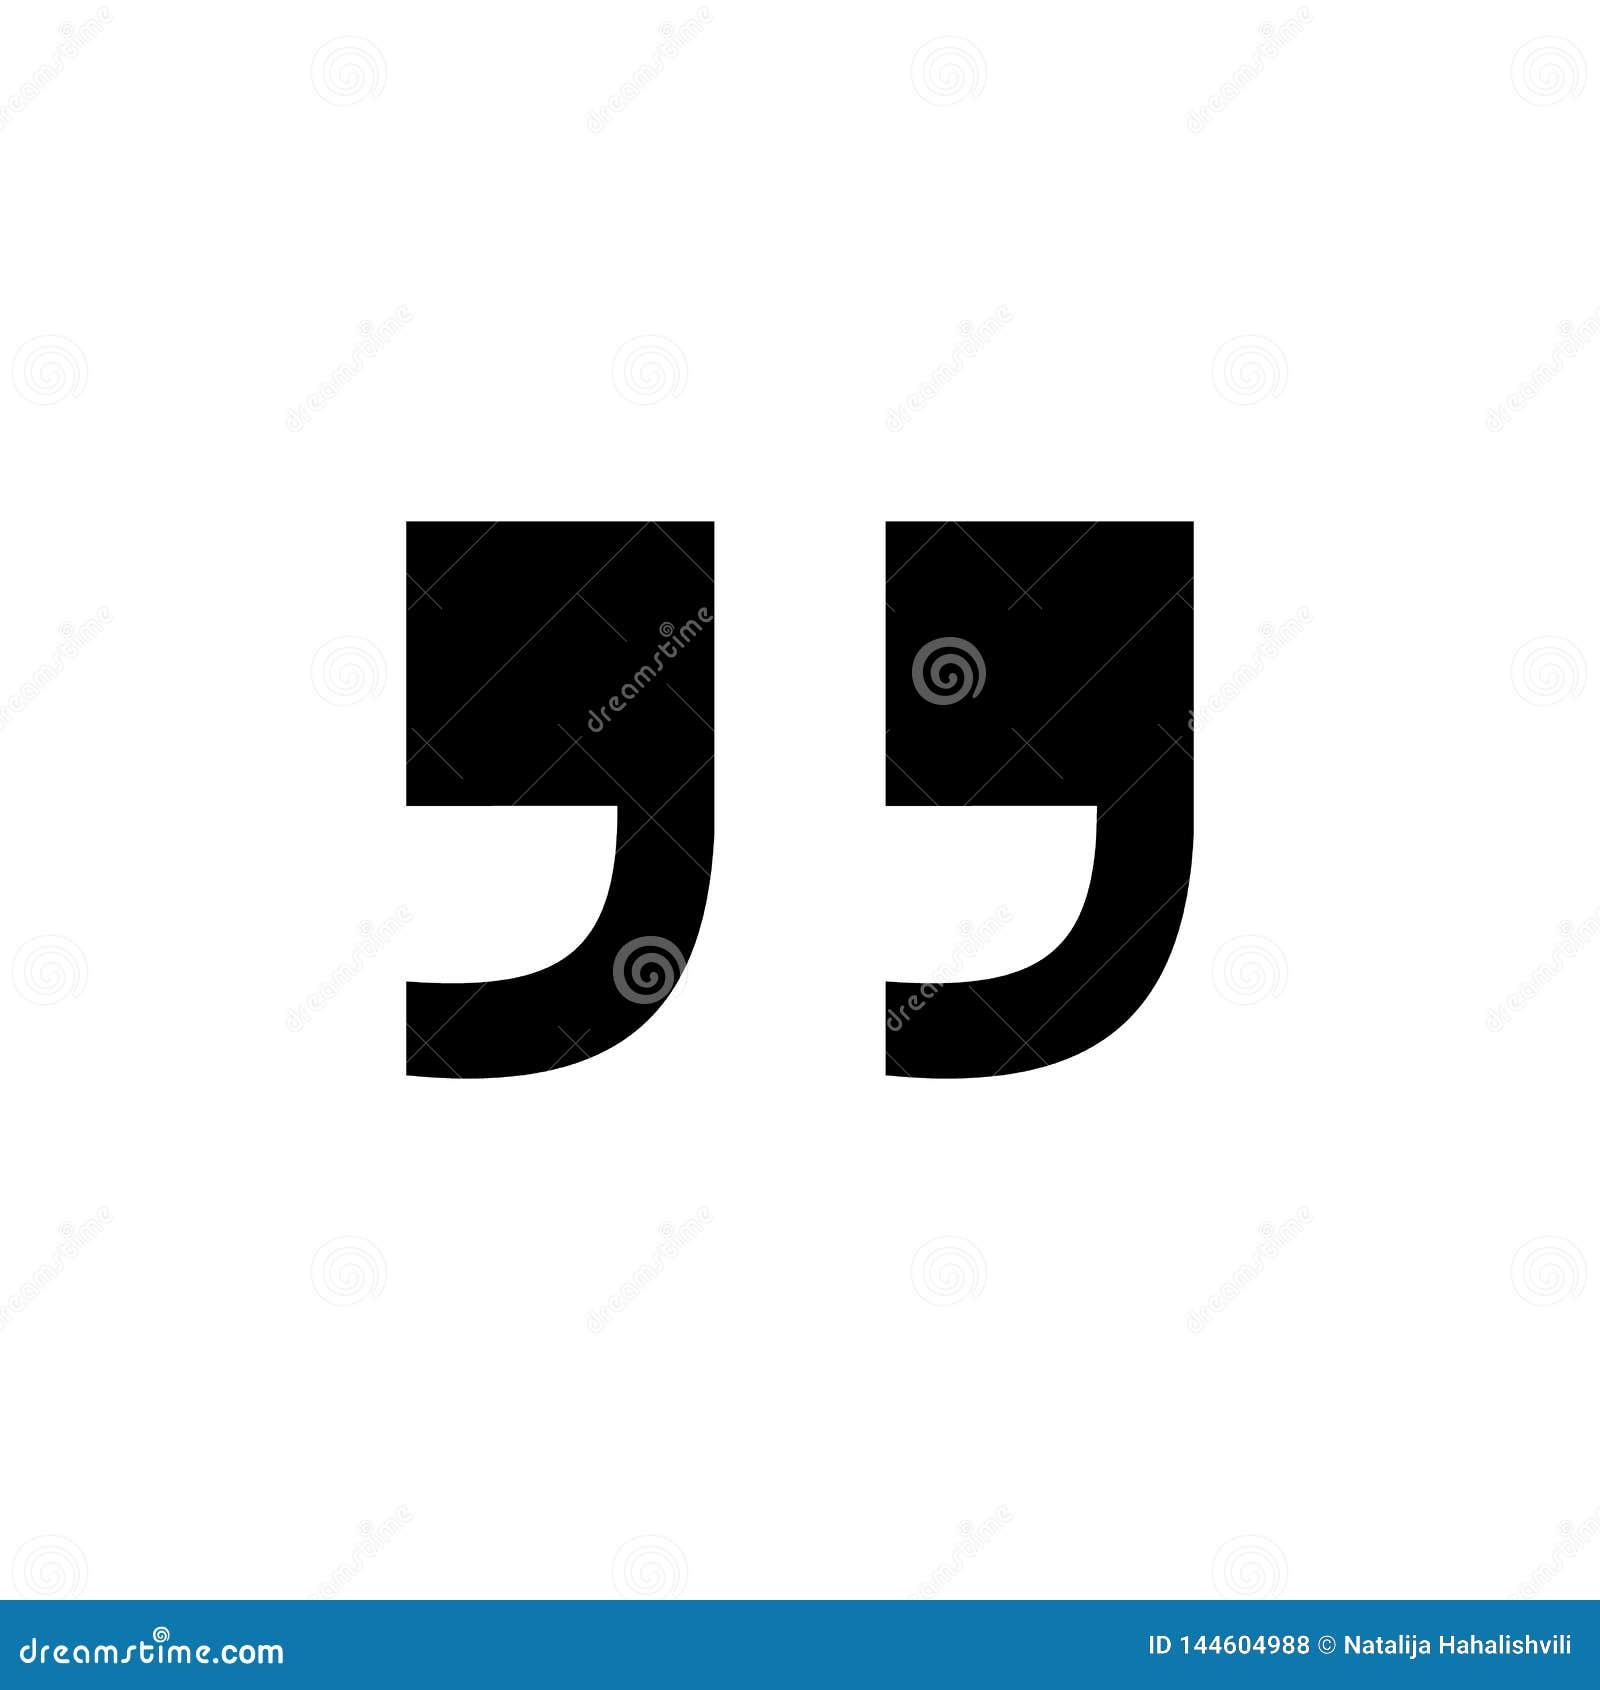 Quote icon. Quote sign icon. Quotation symbol.